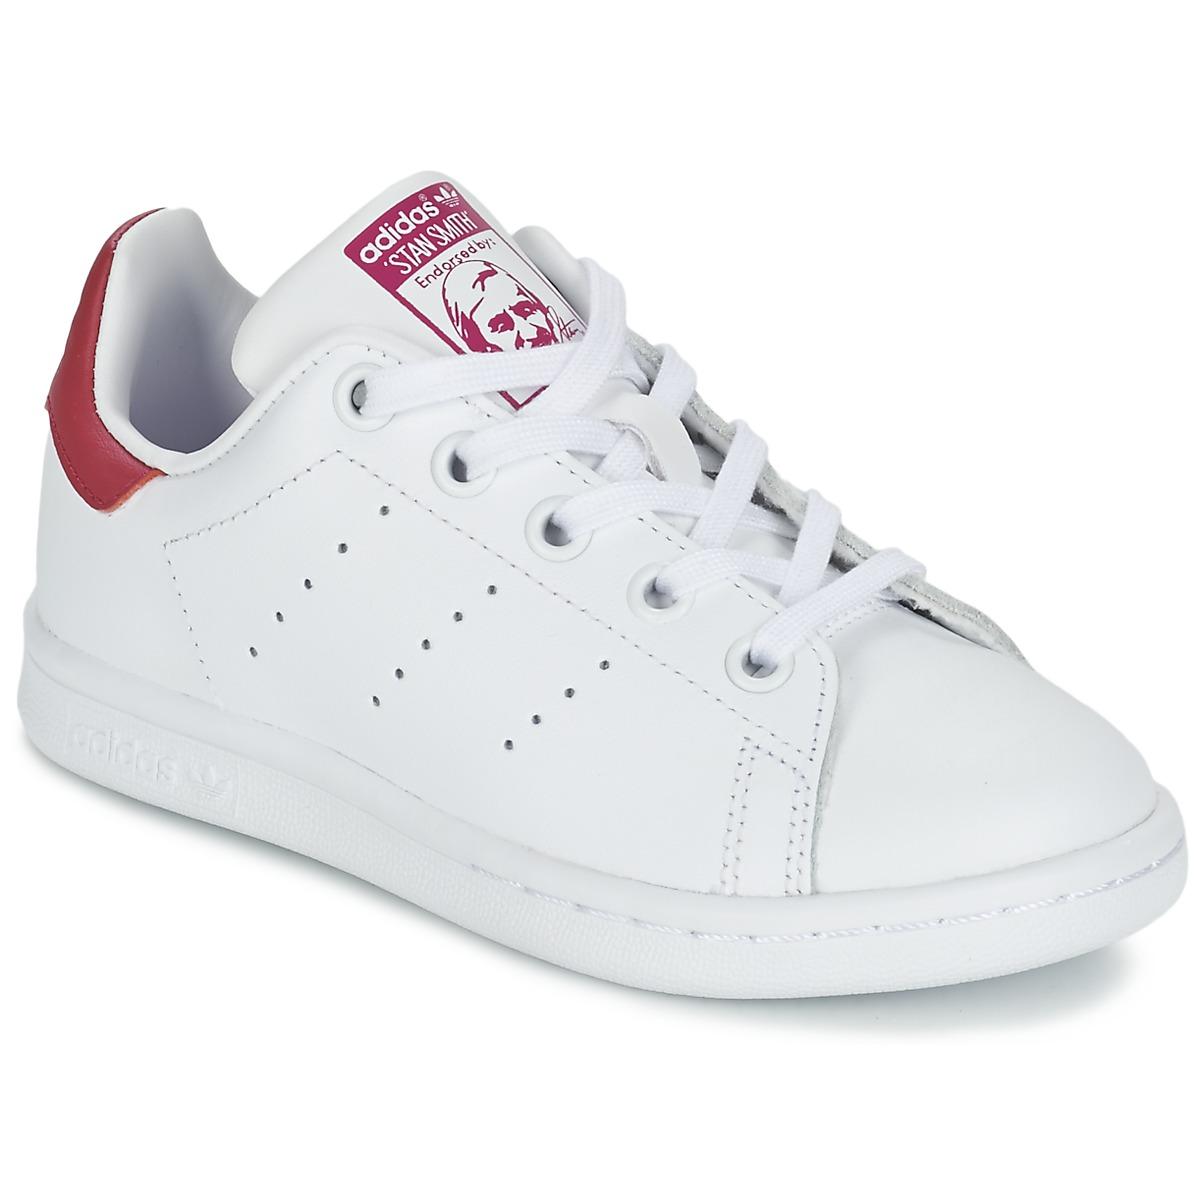 60%OFF adidas Originals STAN SMITH EL C White Pink Shoes Low top trainers  Child 507c6c2ba74